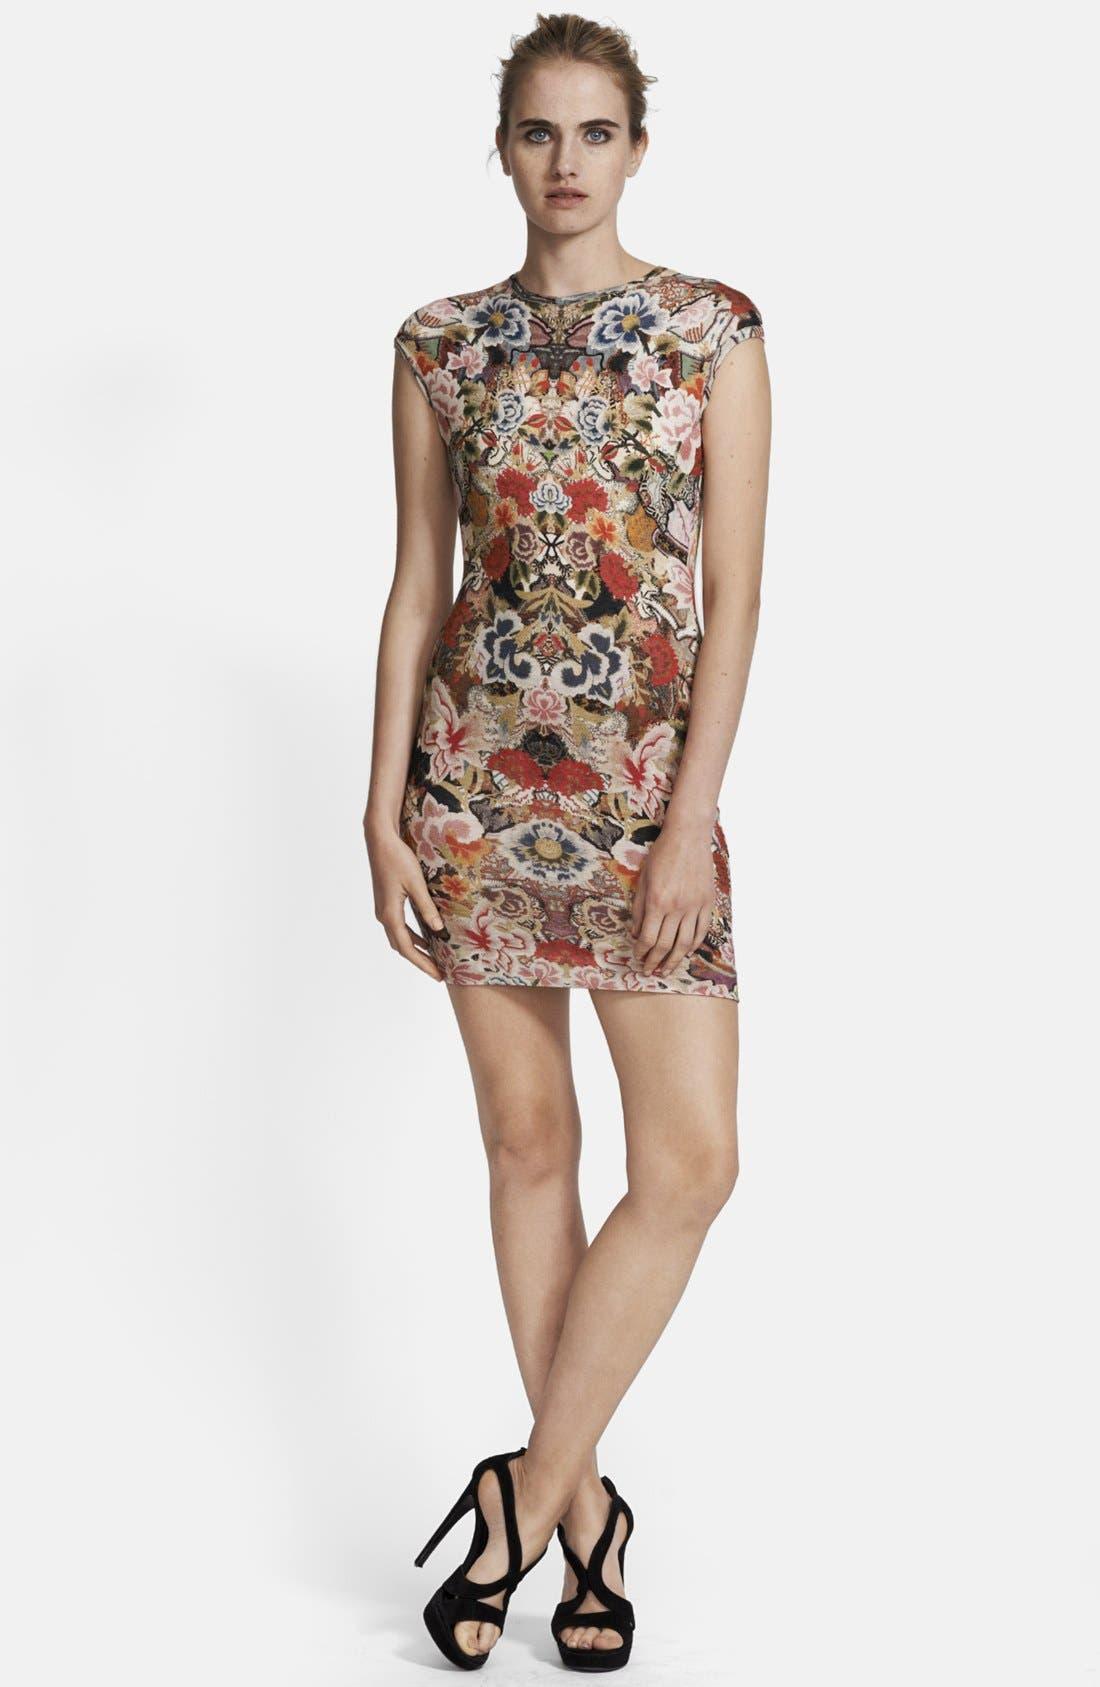 Main Image - Alexander McQueen Patchwork Floral Print Dress